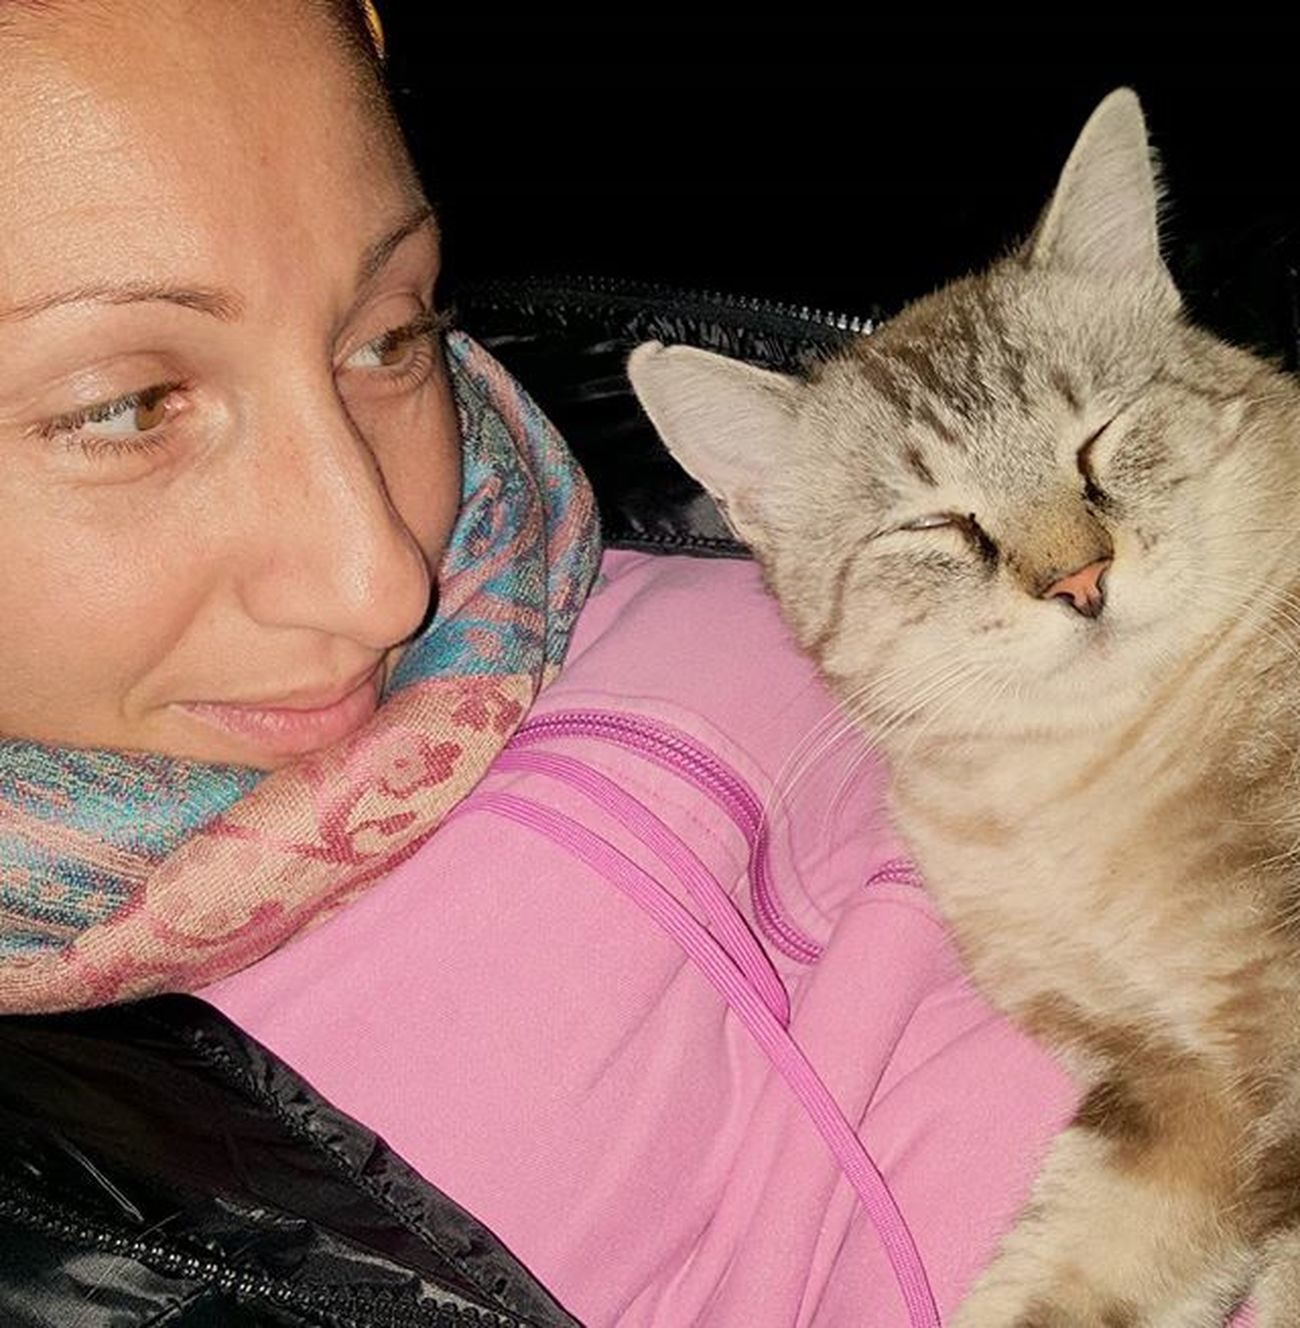 Sweetness.. 😊 Meandacat MeAndCat Ilovecats Ilovecat Loveanimals Cute Sweetcat Cutecat Friendscat Gatto Ioamoigatti Amoigatti CatTherapy